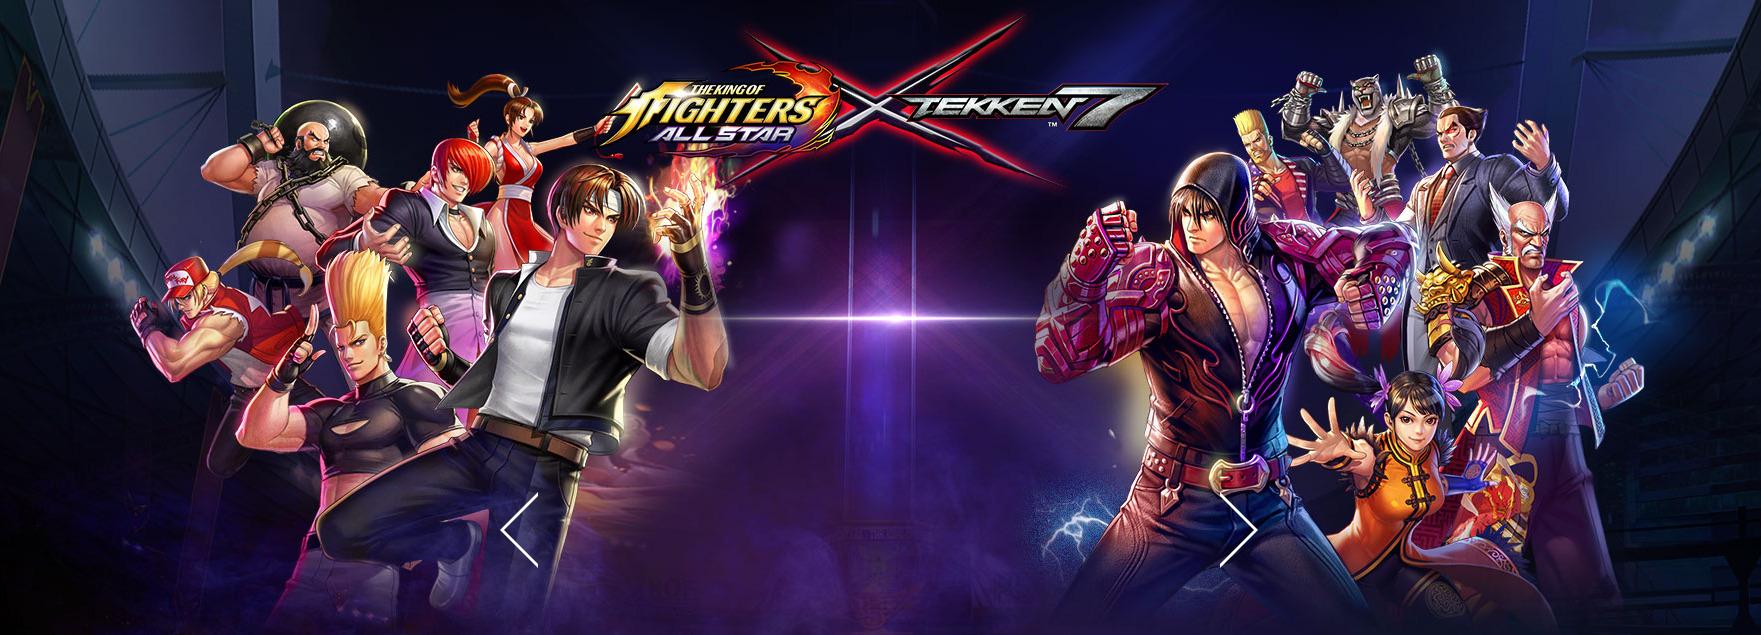 King Of Fighters Allstar Tekken 7 Collaboration Jin Kazama